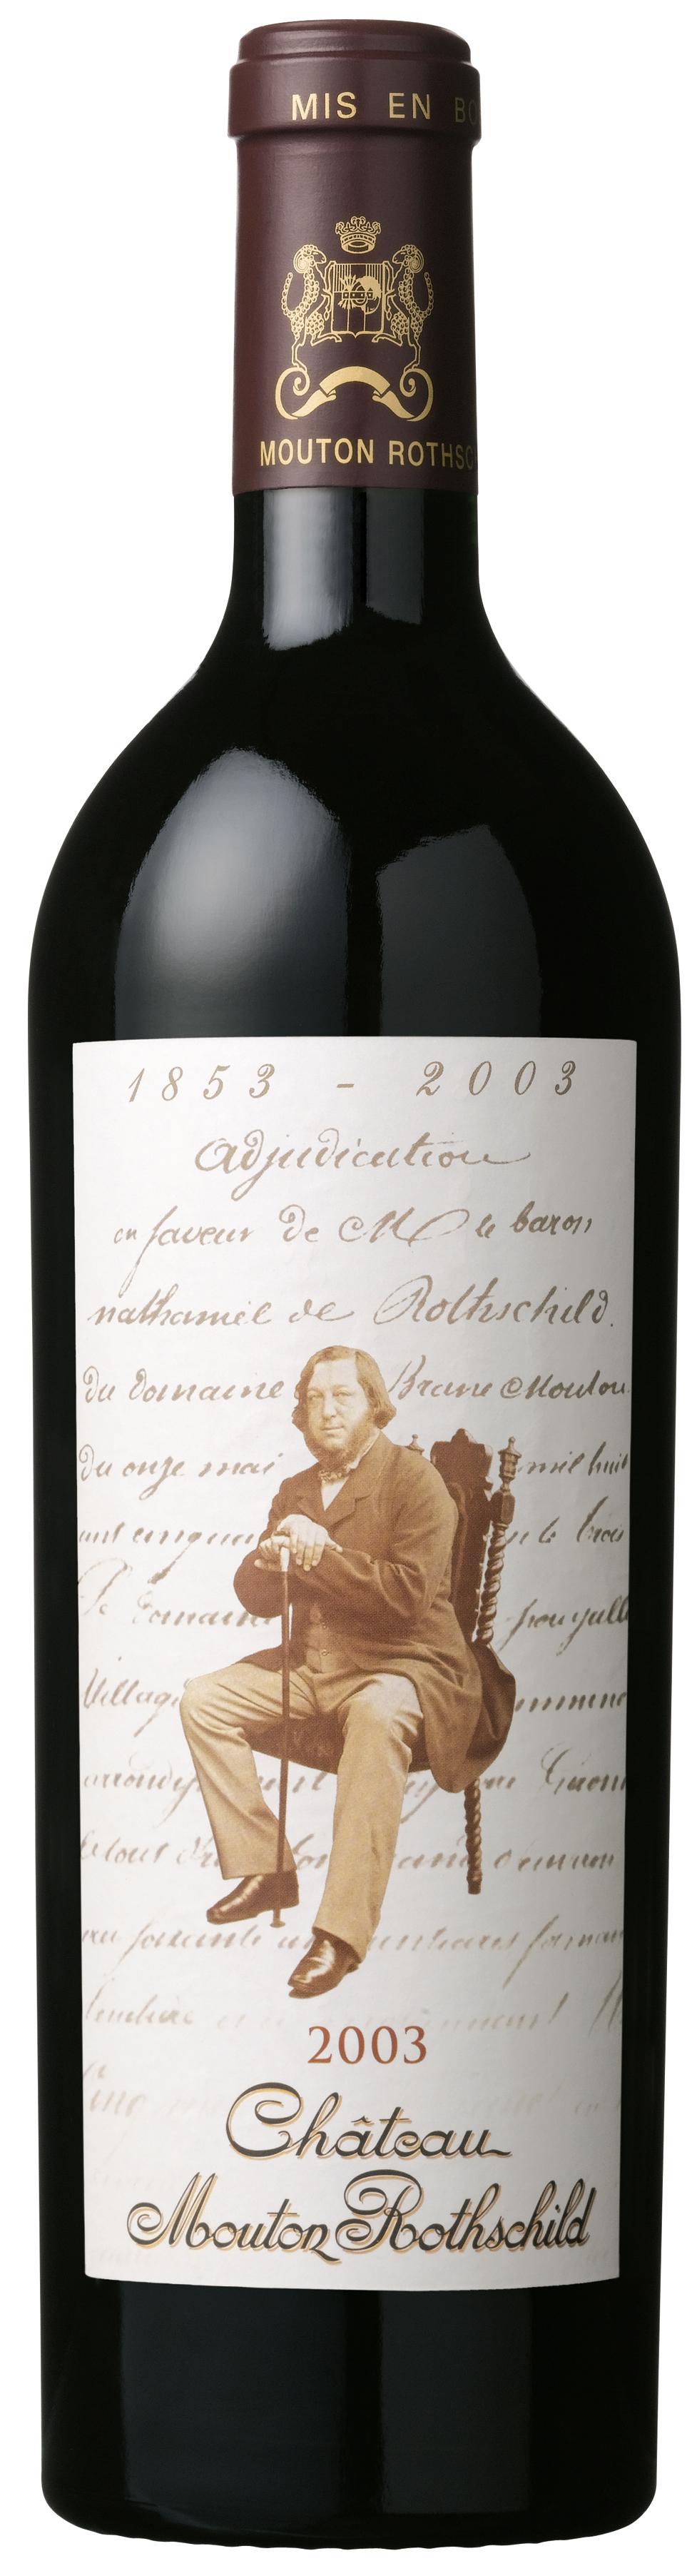 Château Mouton Rothschild 2003